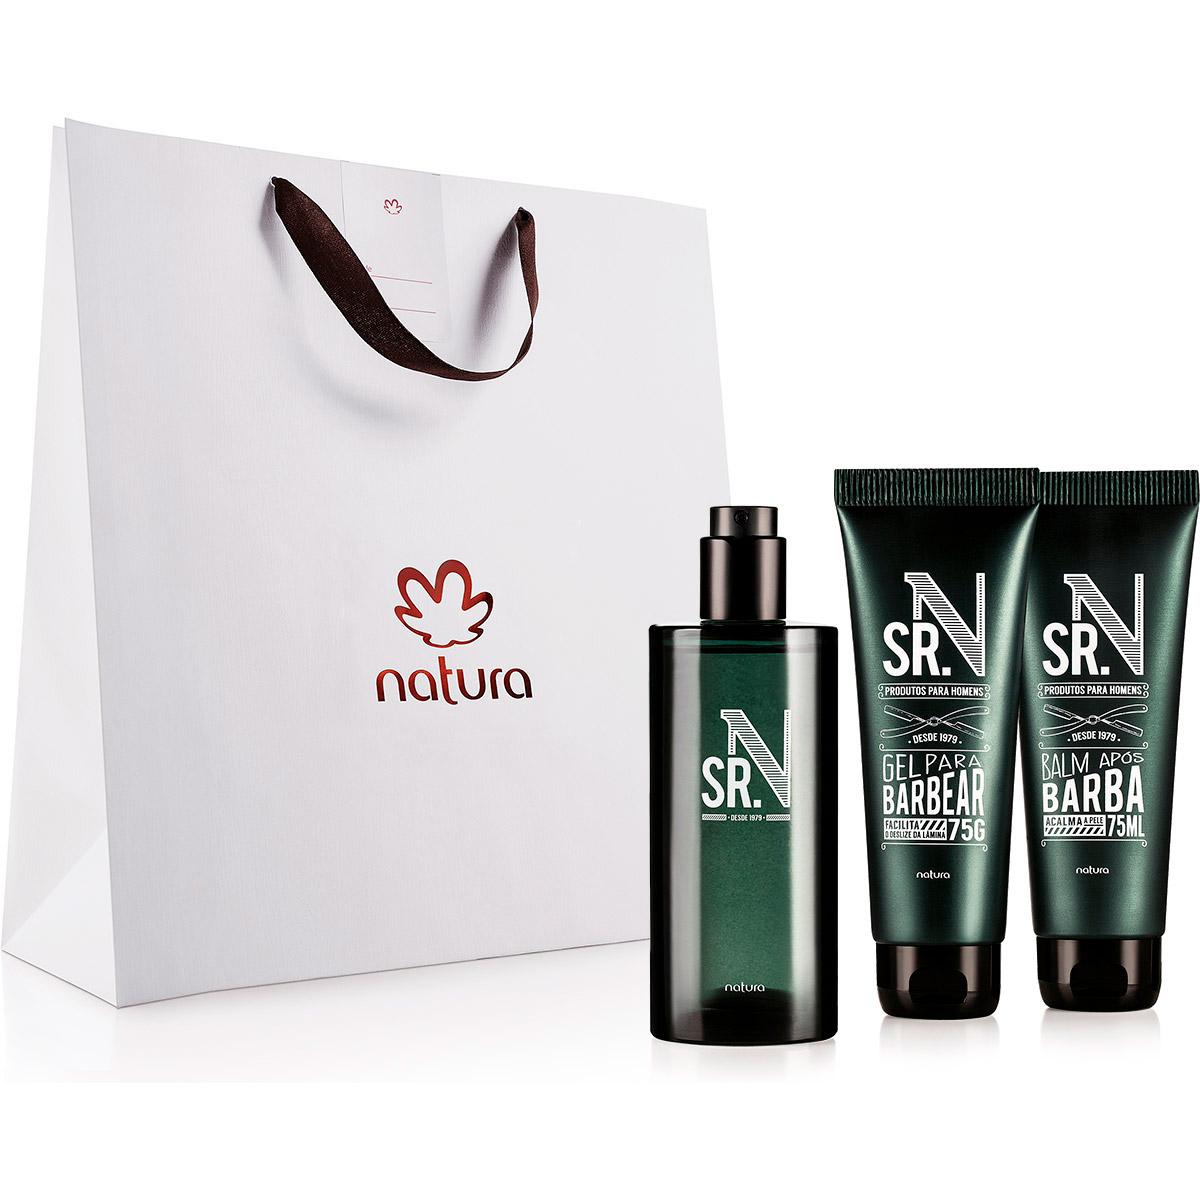 Presente Natura Sr N Perfumaria e Barba - 80423